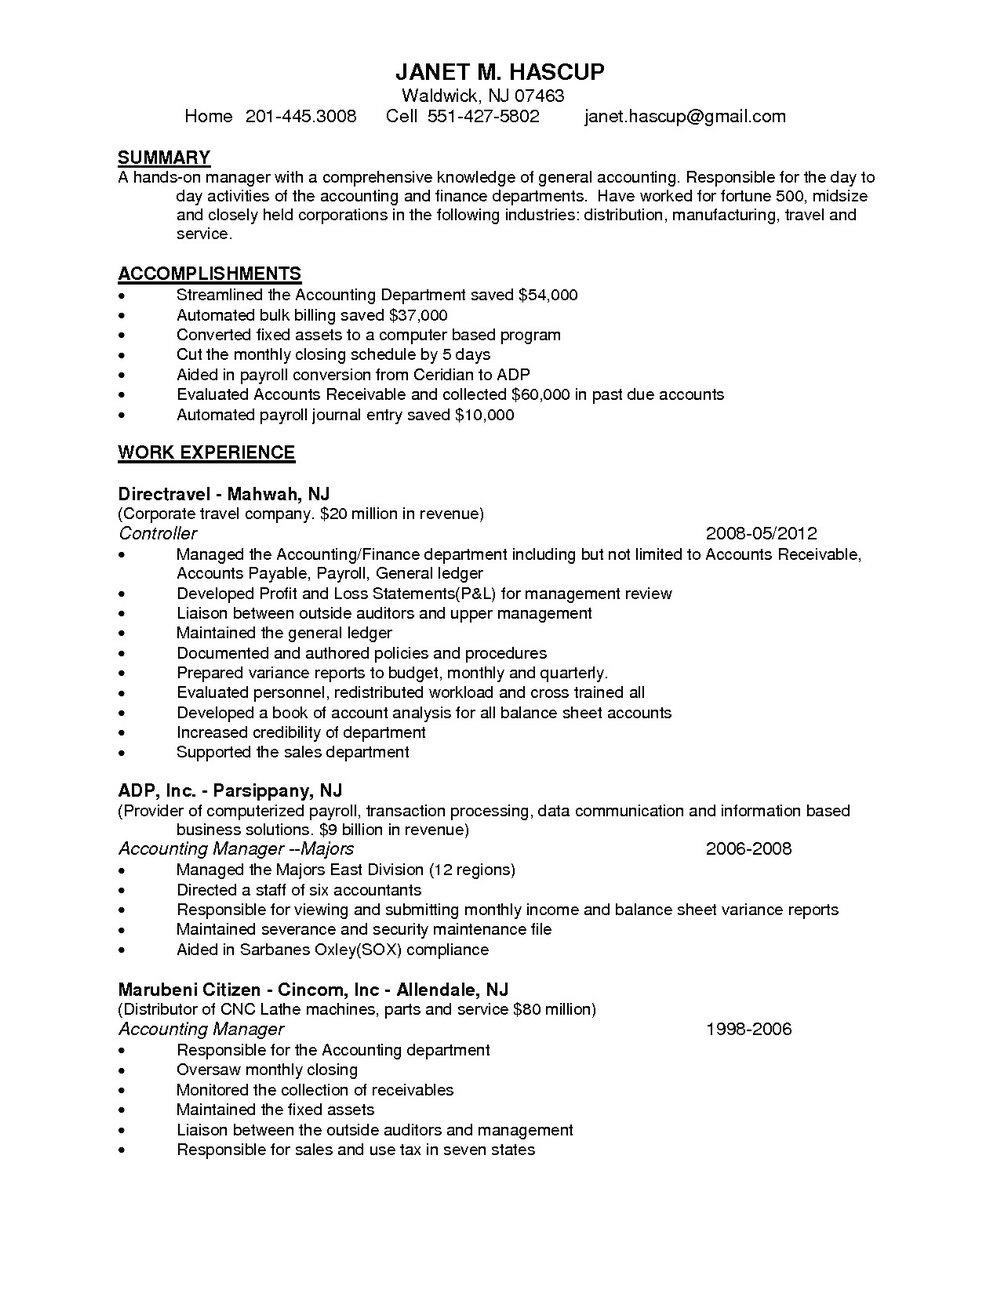 Resume Samples For Accounts Receivable Clerk